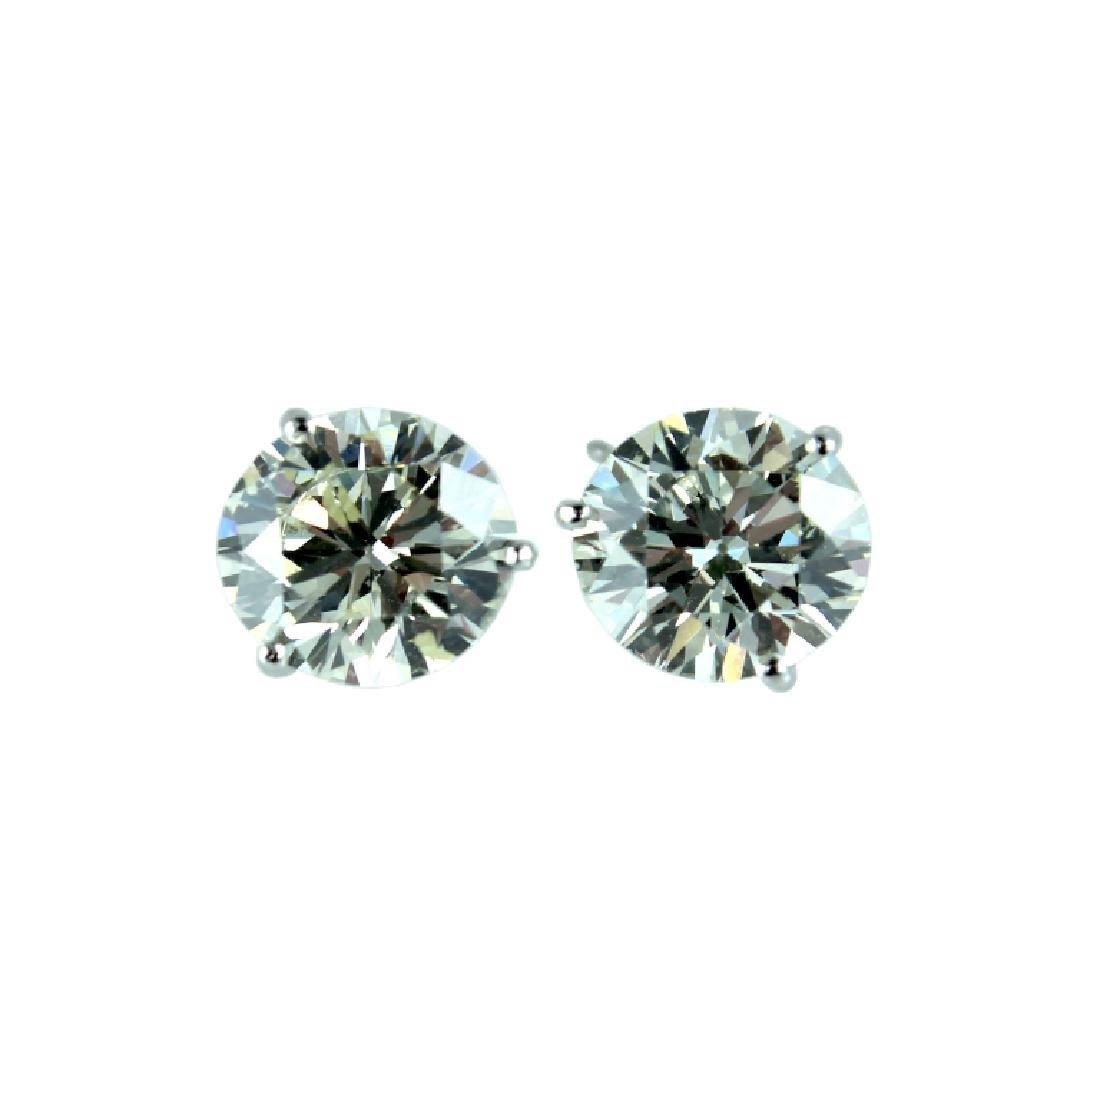 Fabulous Pair 9.39CTS Round Diamond Earrings